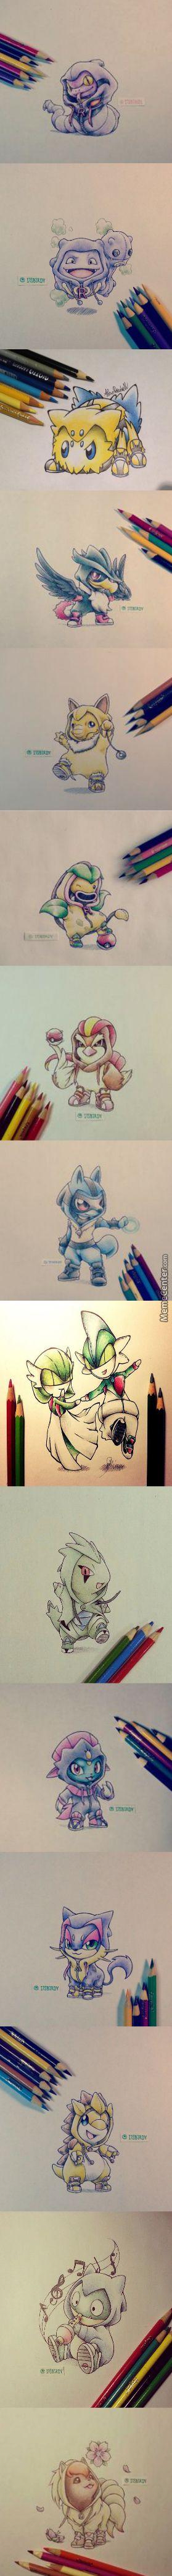 Pokemon in Evolution Costumes Pt. 4